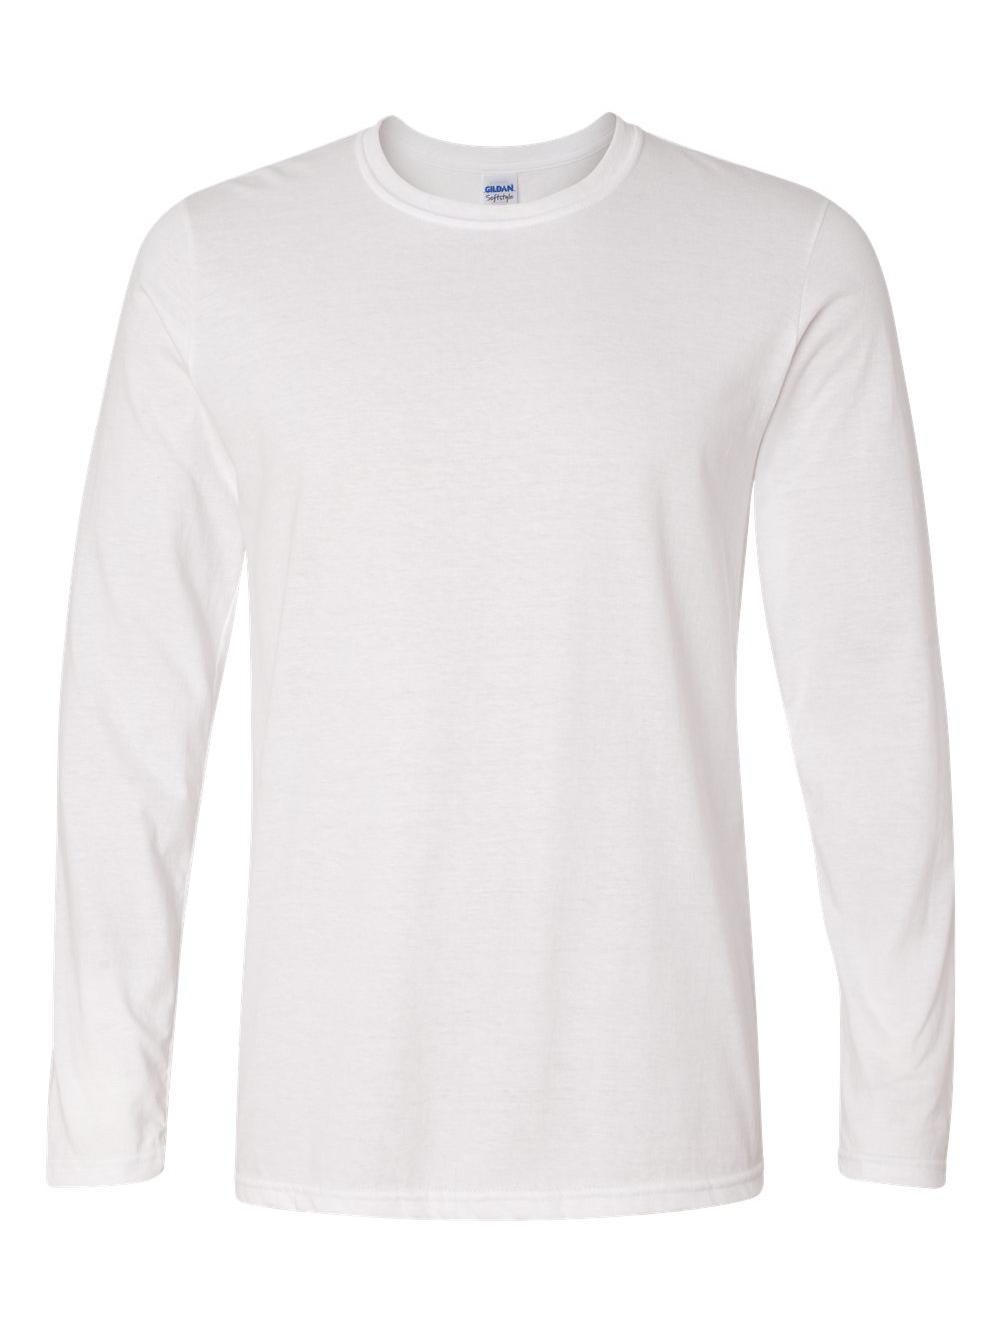 Gildan-Softstyle-Long-Sleeve-T-Shirt-64400 thumbnail 21